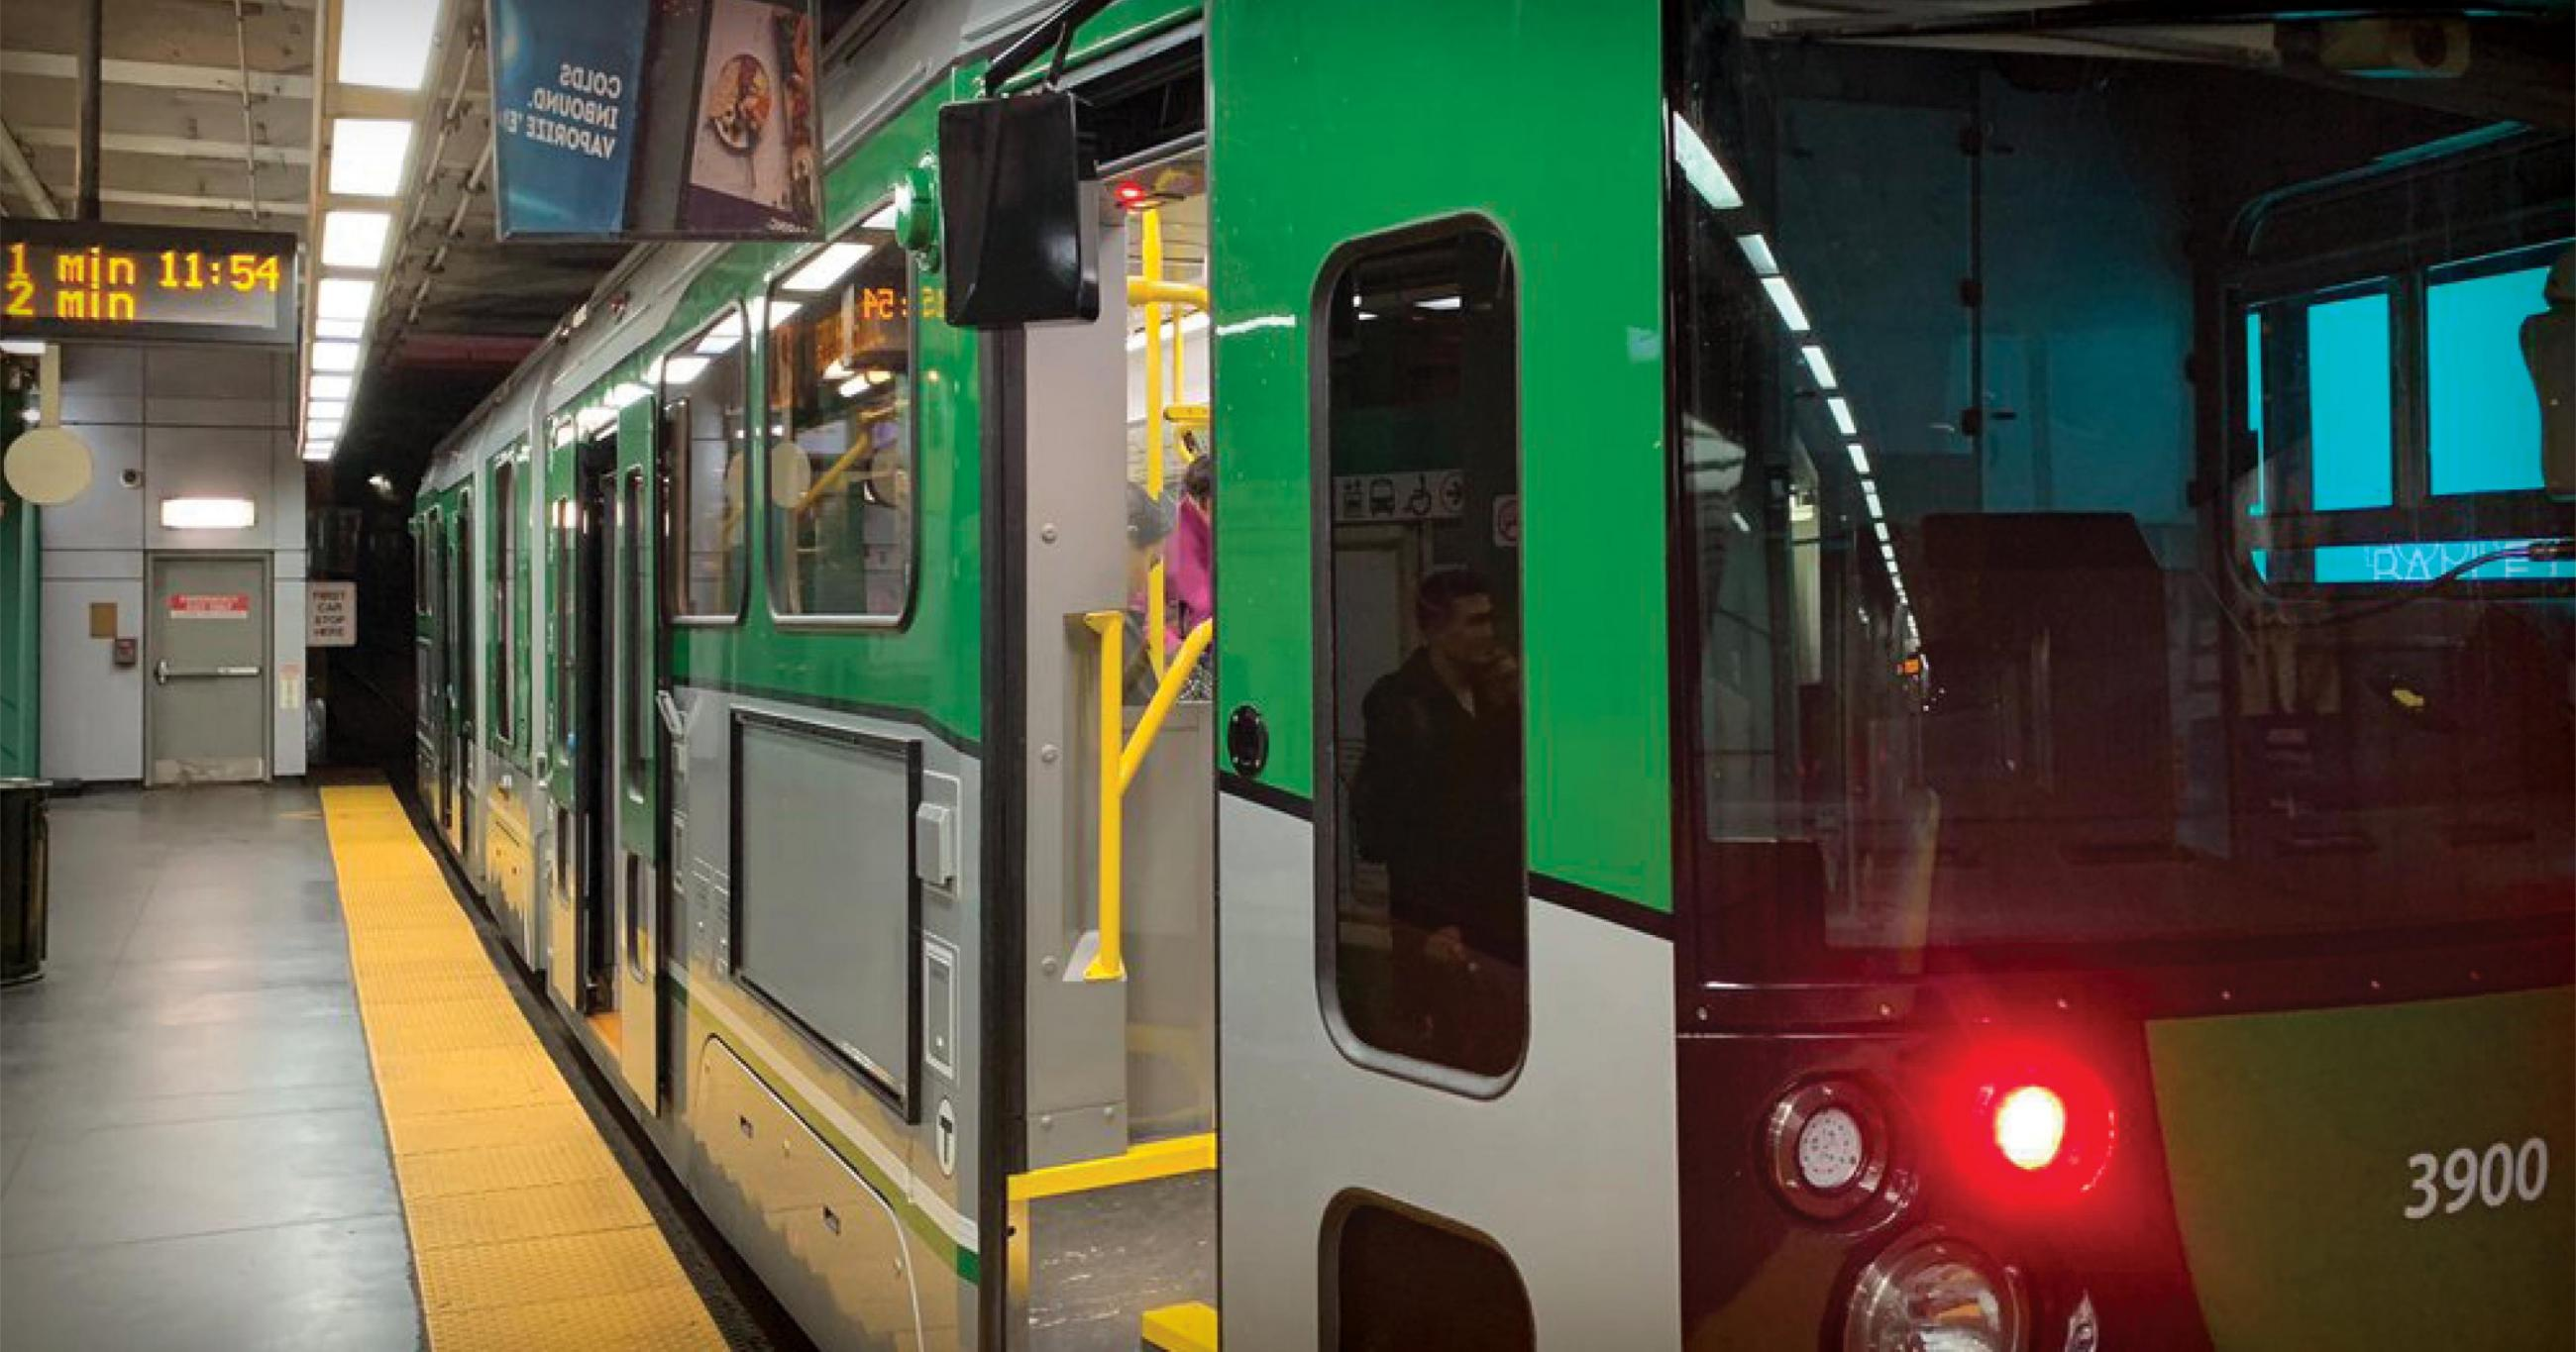 New Green Line car at Government Center platform